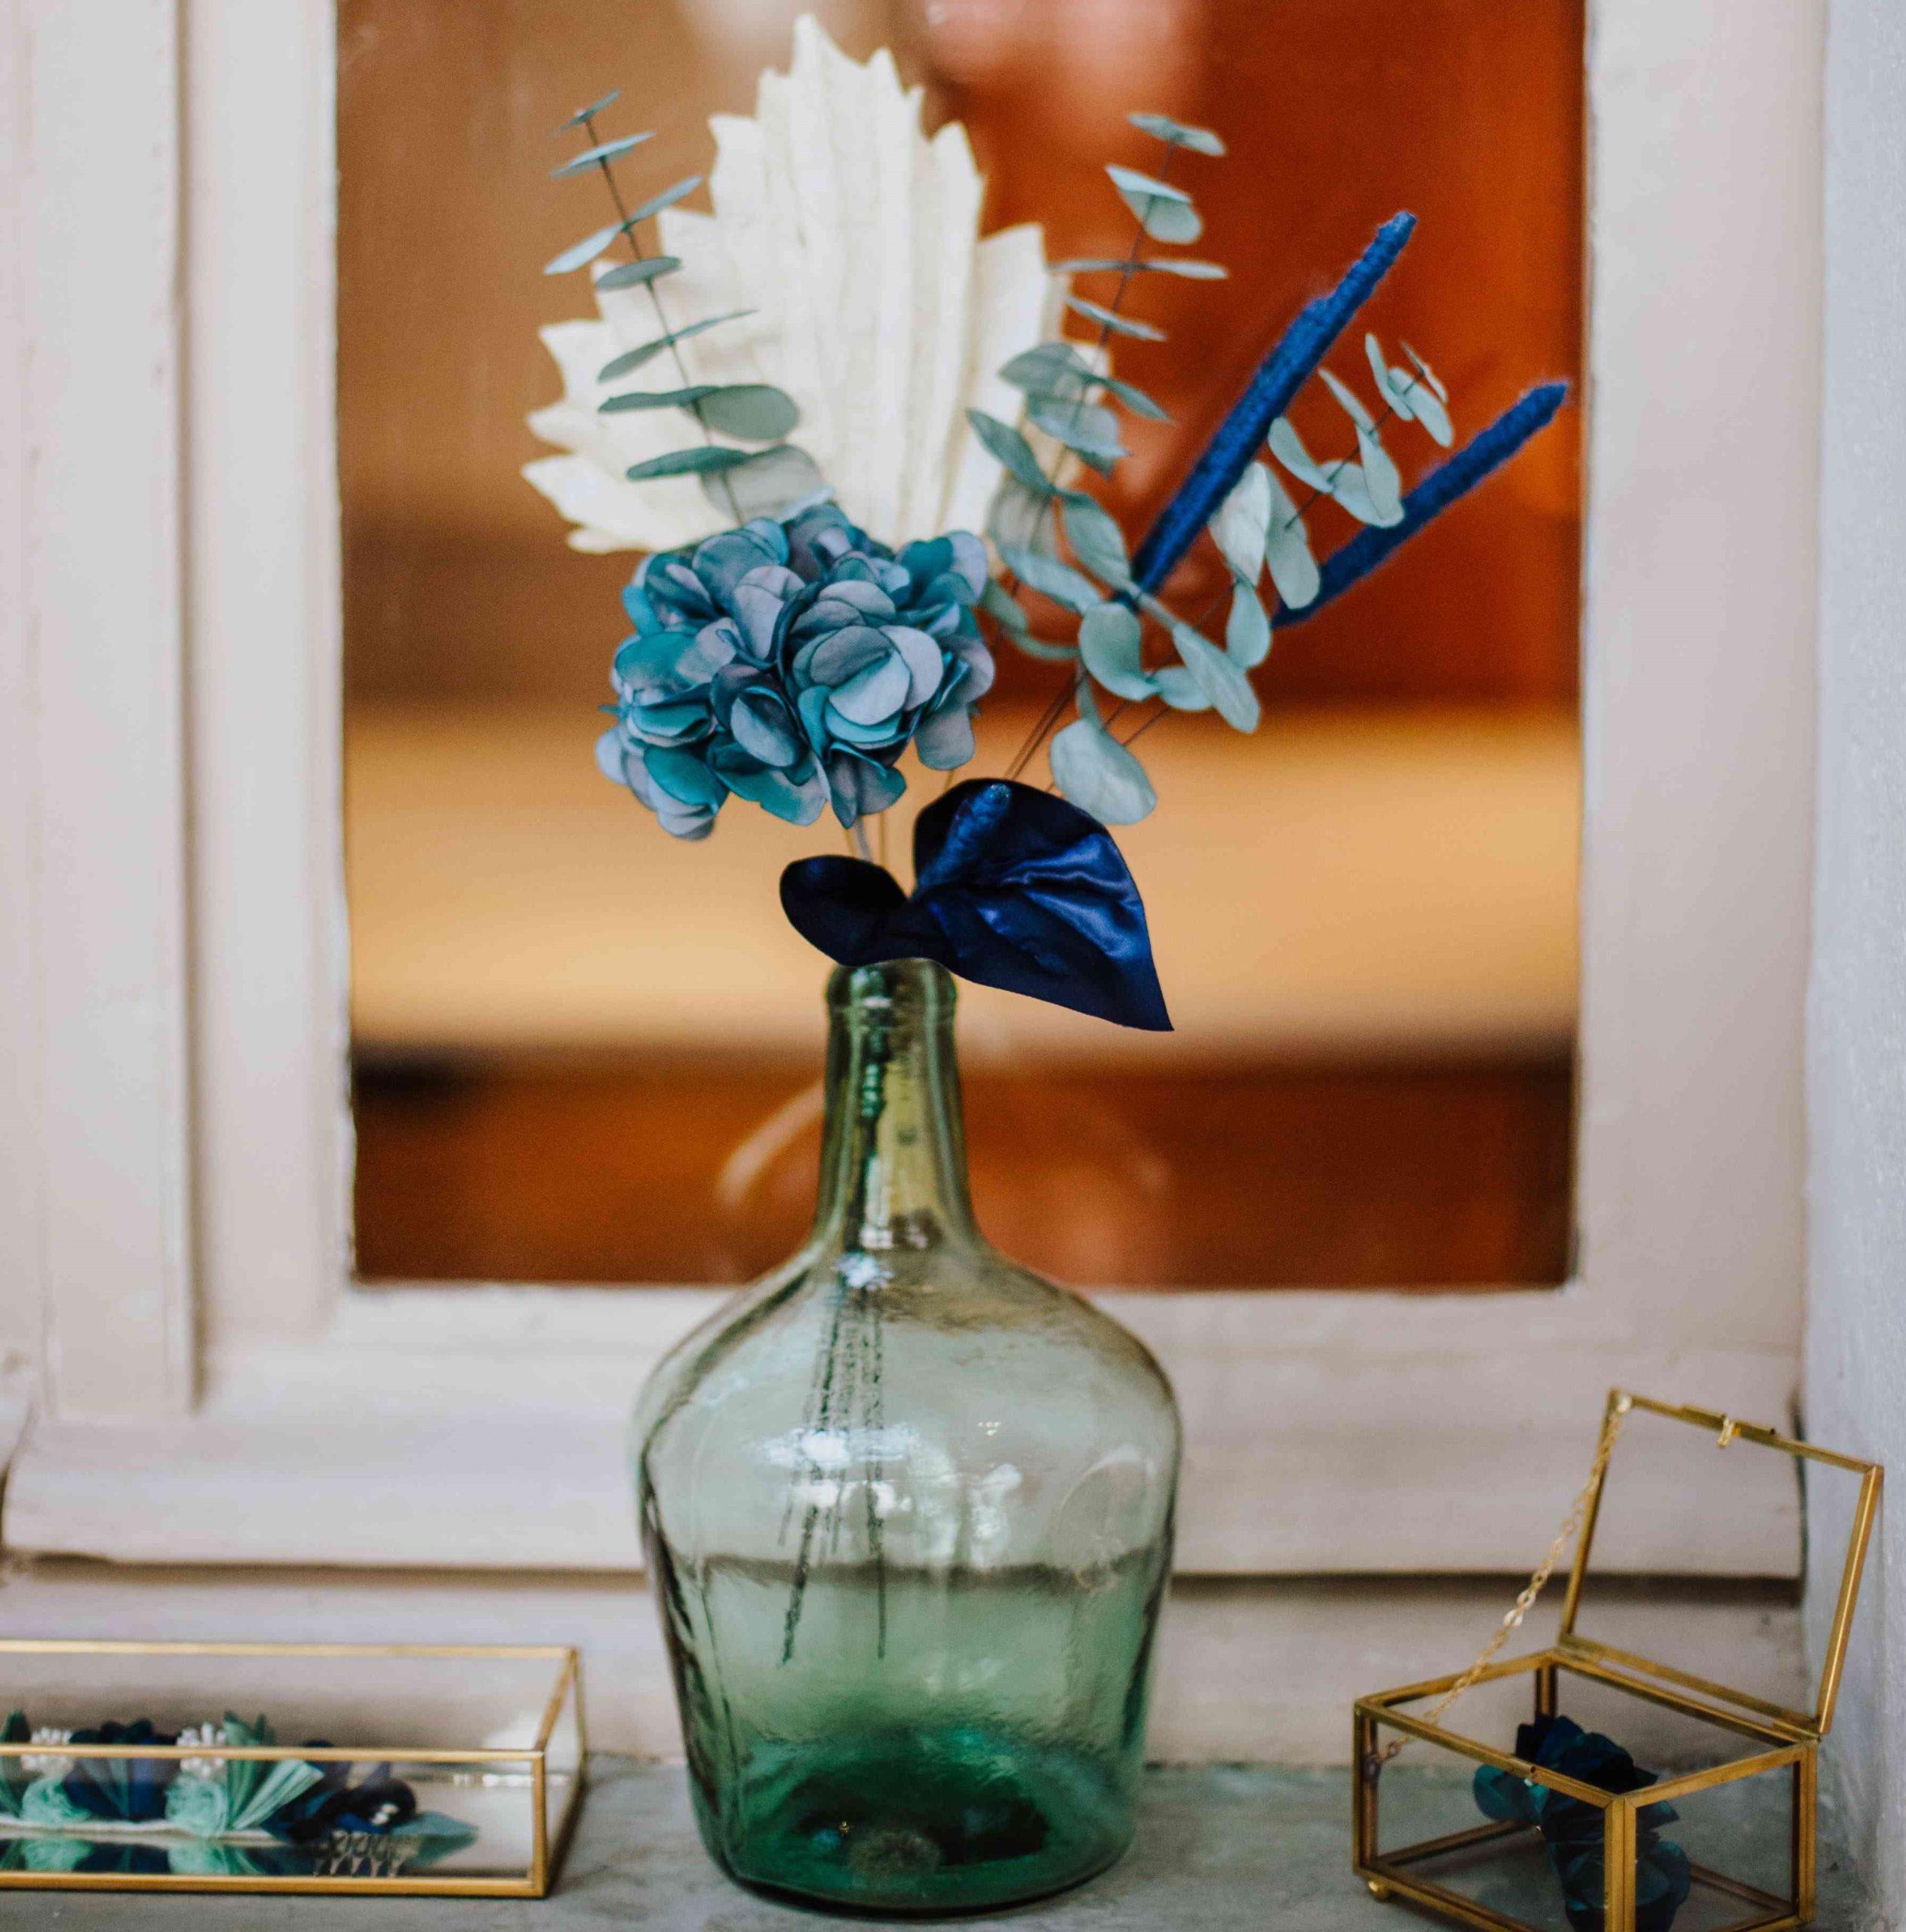 Bouquet sauvage 1 Alice Marty - Couture florale Accessoires Mariage